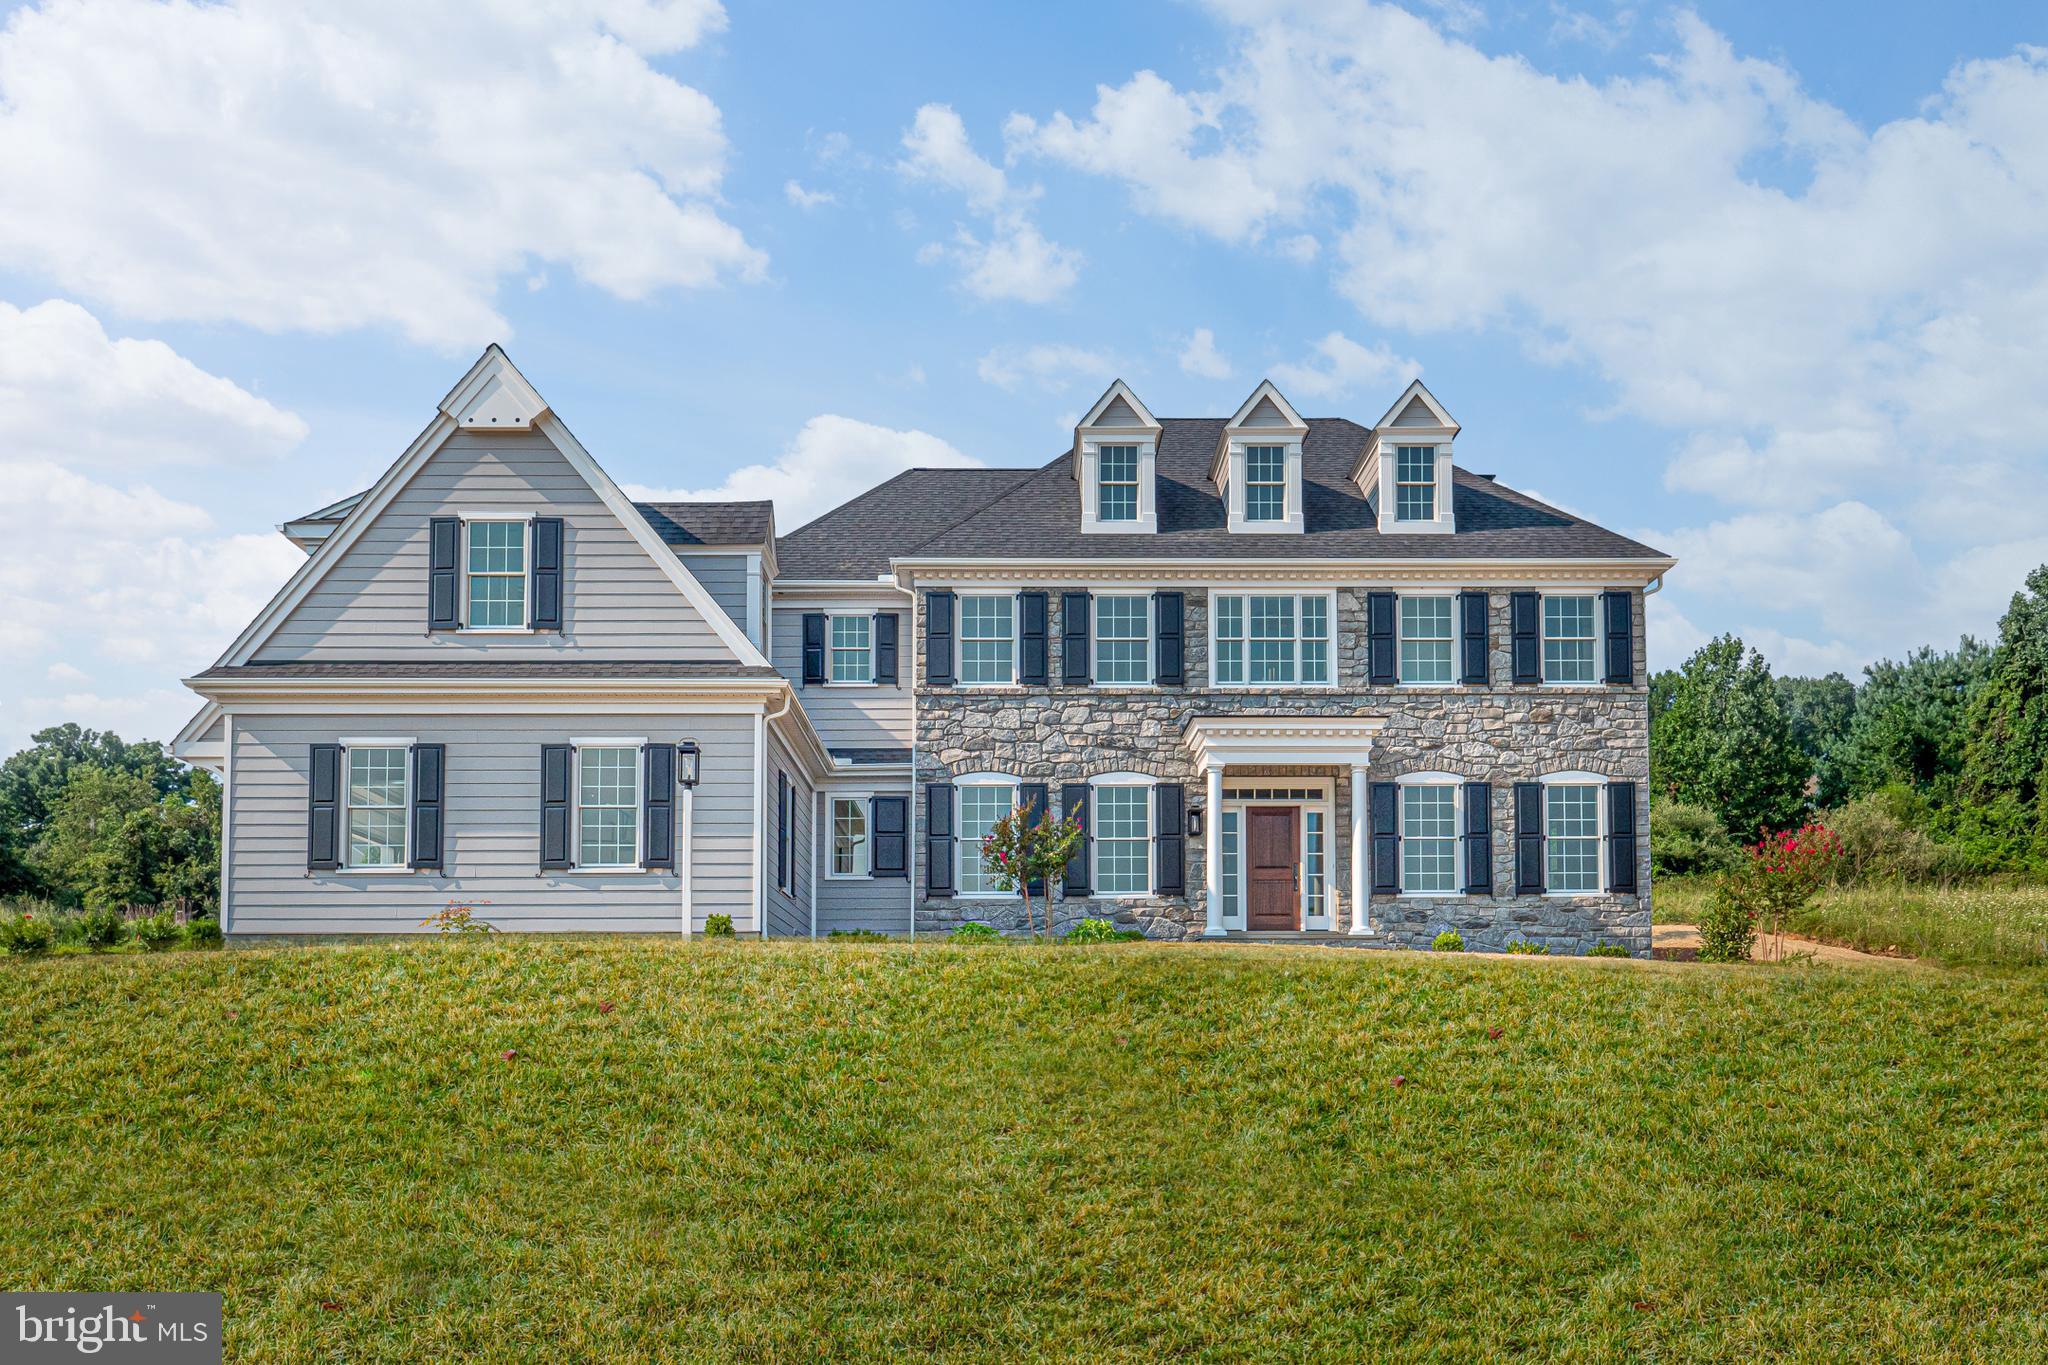 550A HOPWOOD ROAD, COLLEGEVILLE, Pennsylvania 19426, 5 Bedrooms Bedrooms, ,6 BathroomsBathrooms,Single Family,For Sale,550A HOPWOOD ROAD,PAMC690804